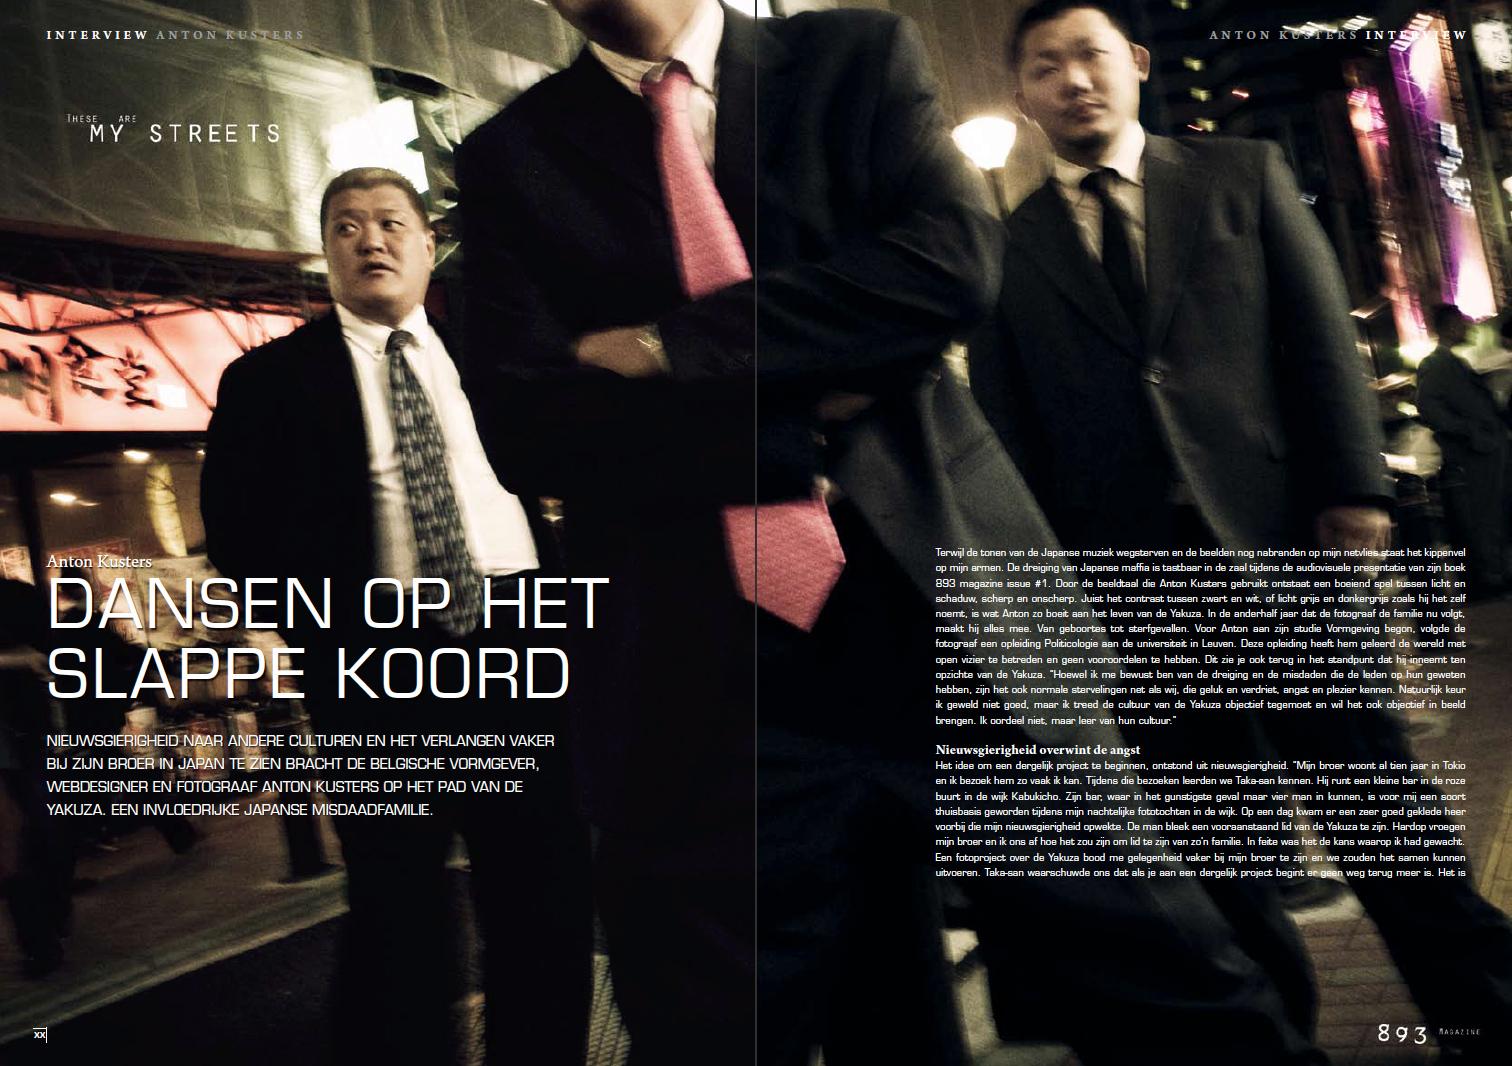 interview_fotografie_01-11_p1-2.jpg